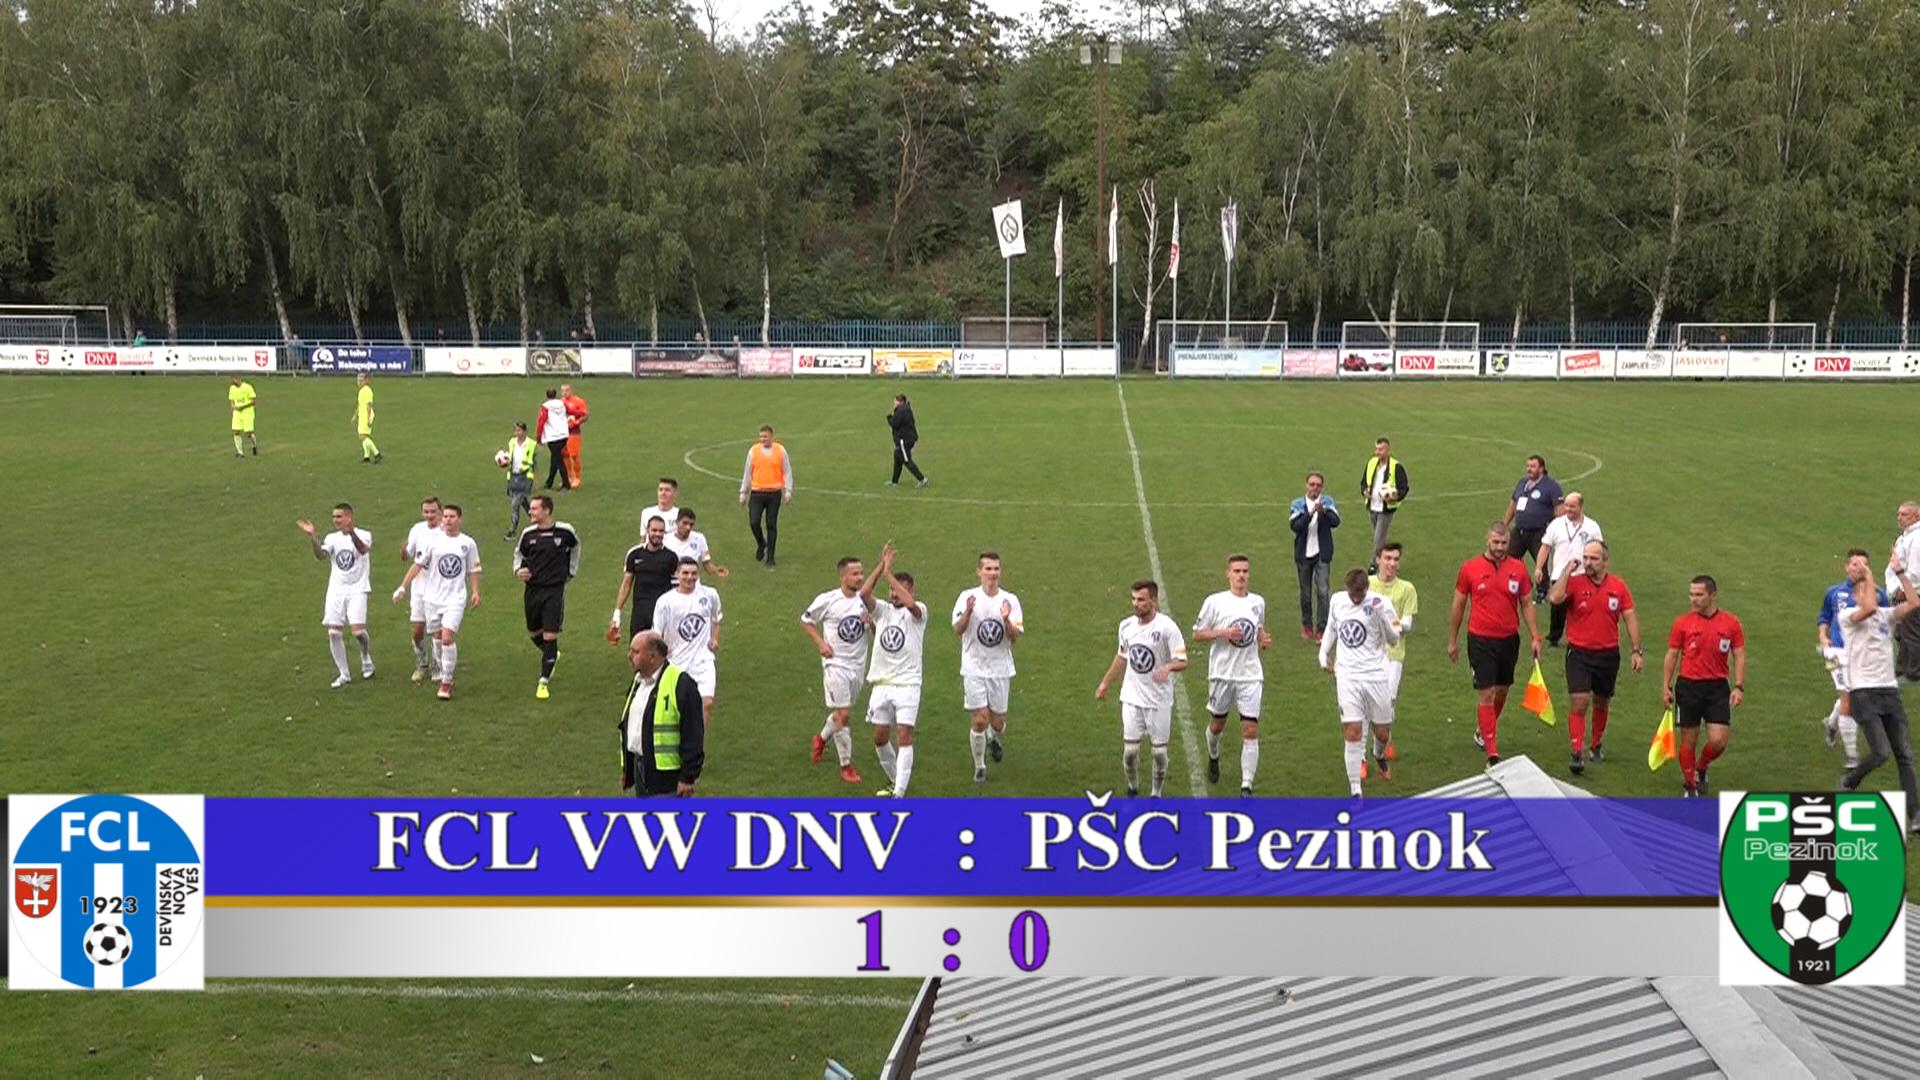 FCL VW DNV : PŠC Pezinok